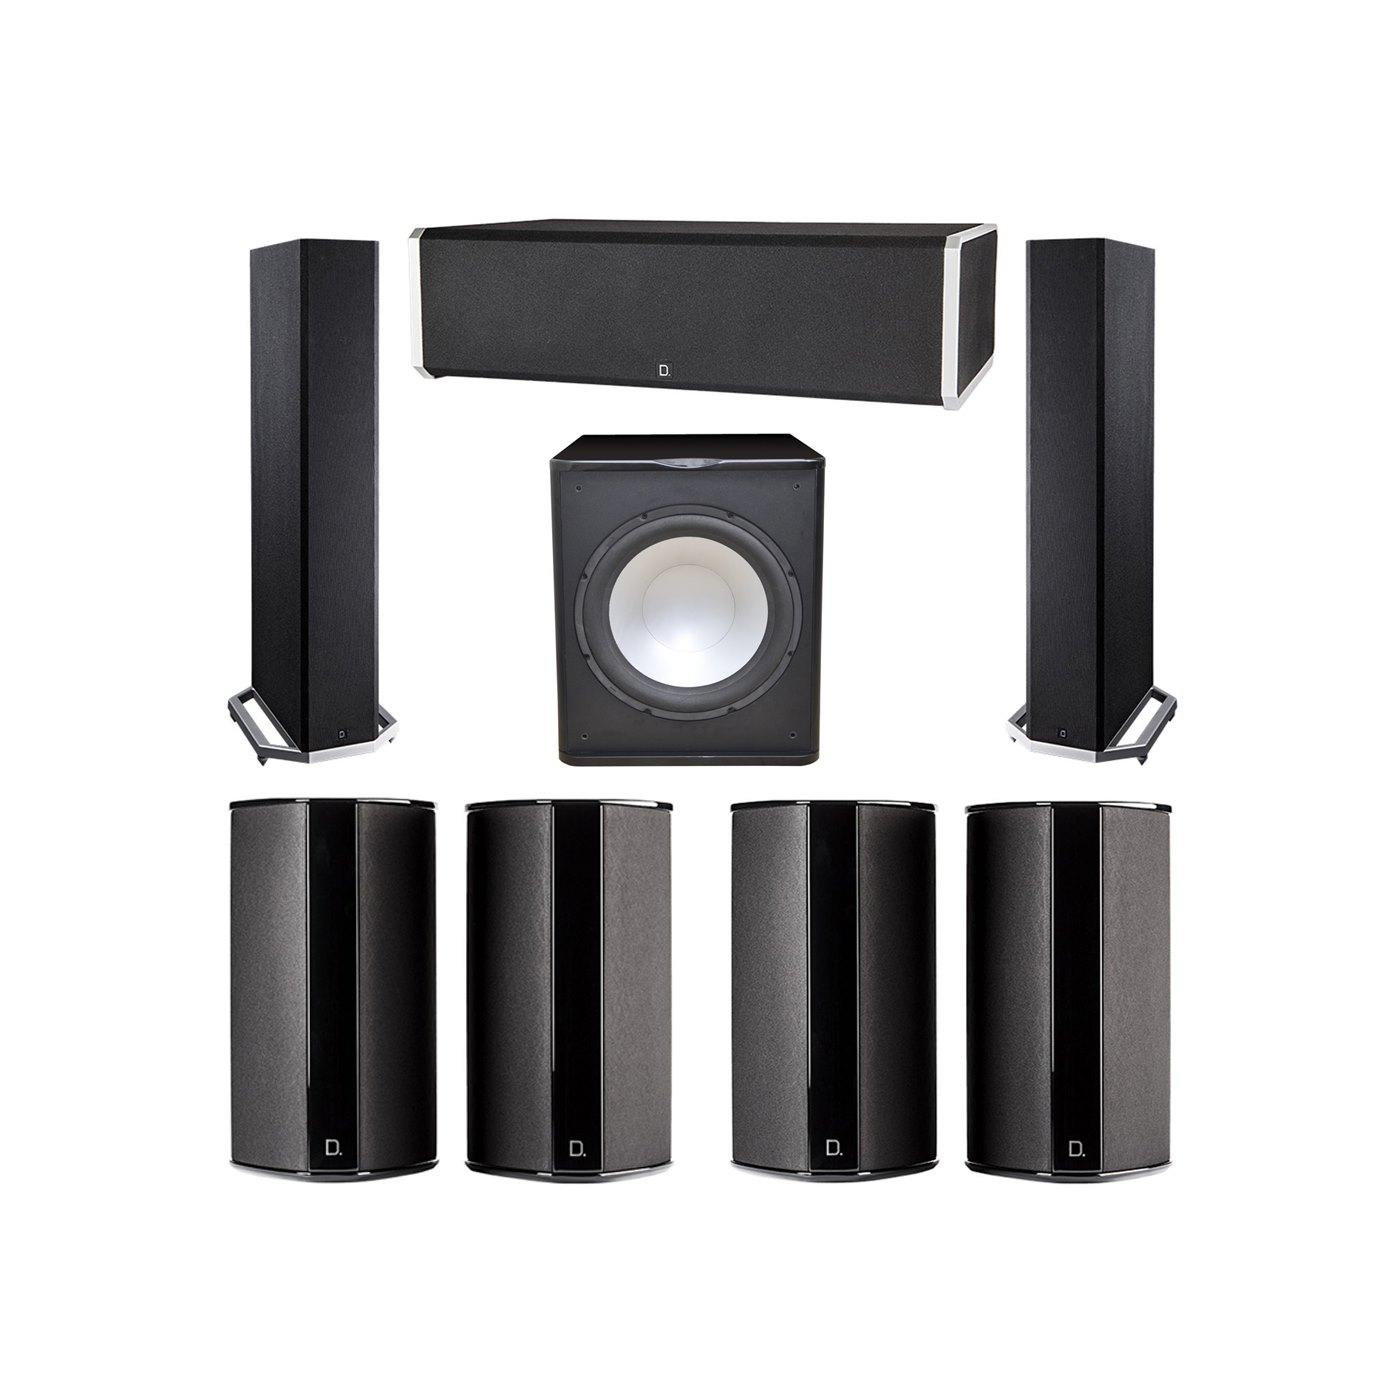 Definitive Technology 7.1 System with 2 BP9020 Tower Speakers, 1 CS9060 Center Channel Speaker, 4 SR9080 Surround Speaker, 1 Premier Acoustic PA-150 Subwoofer